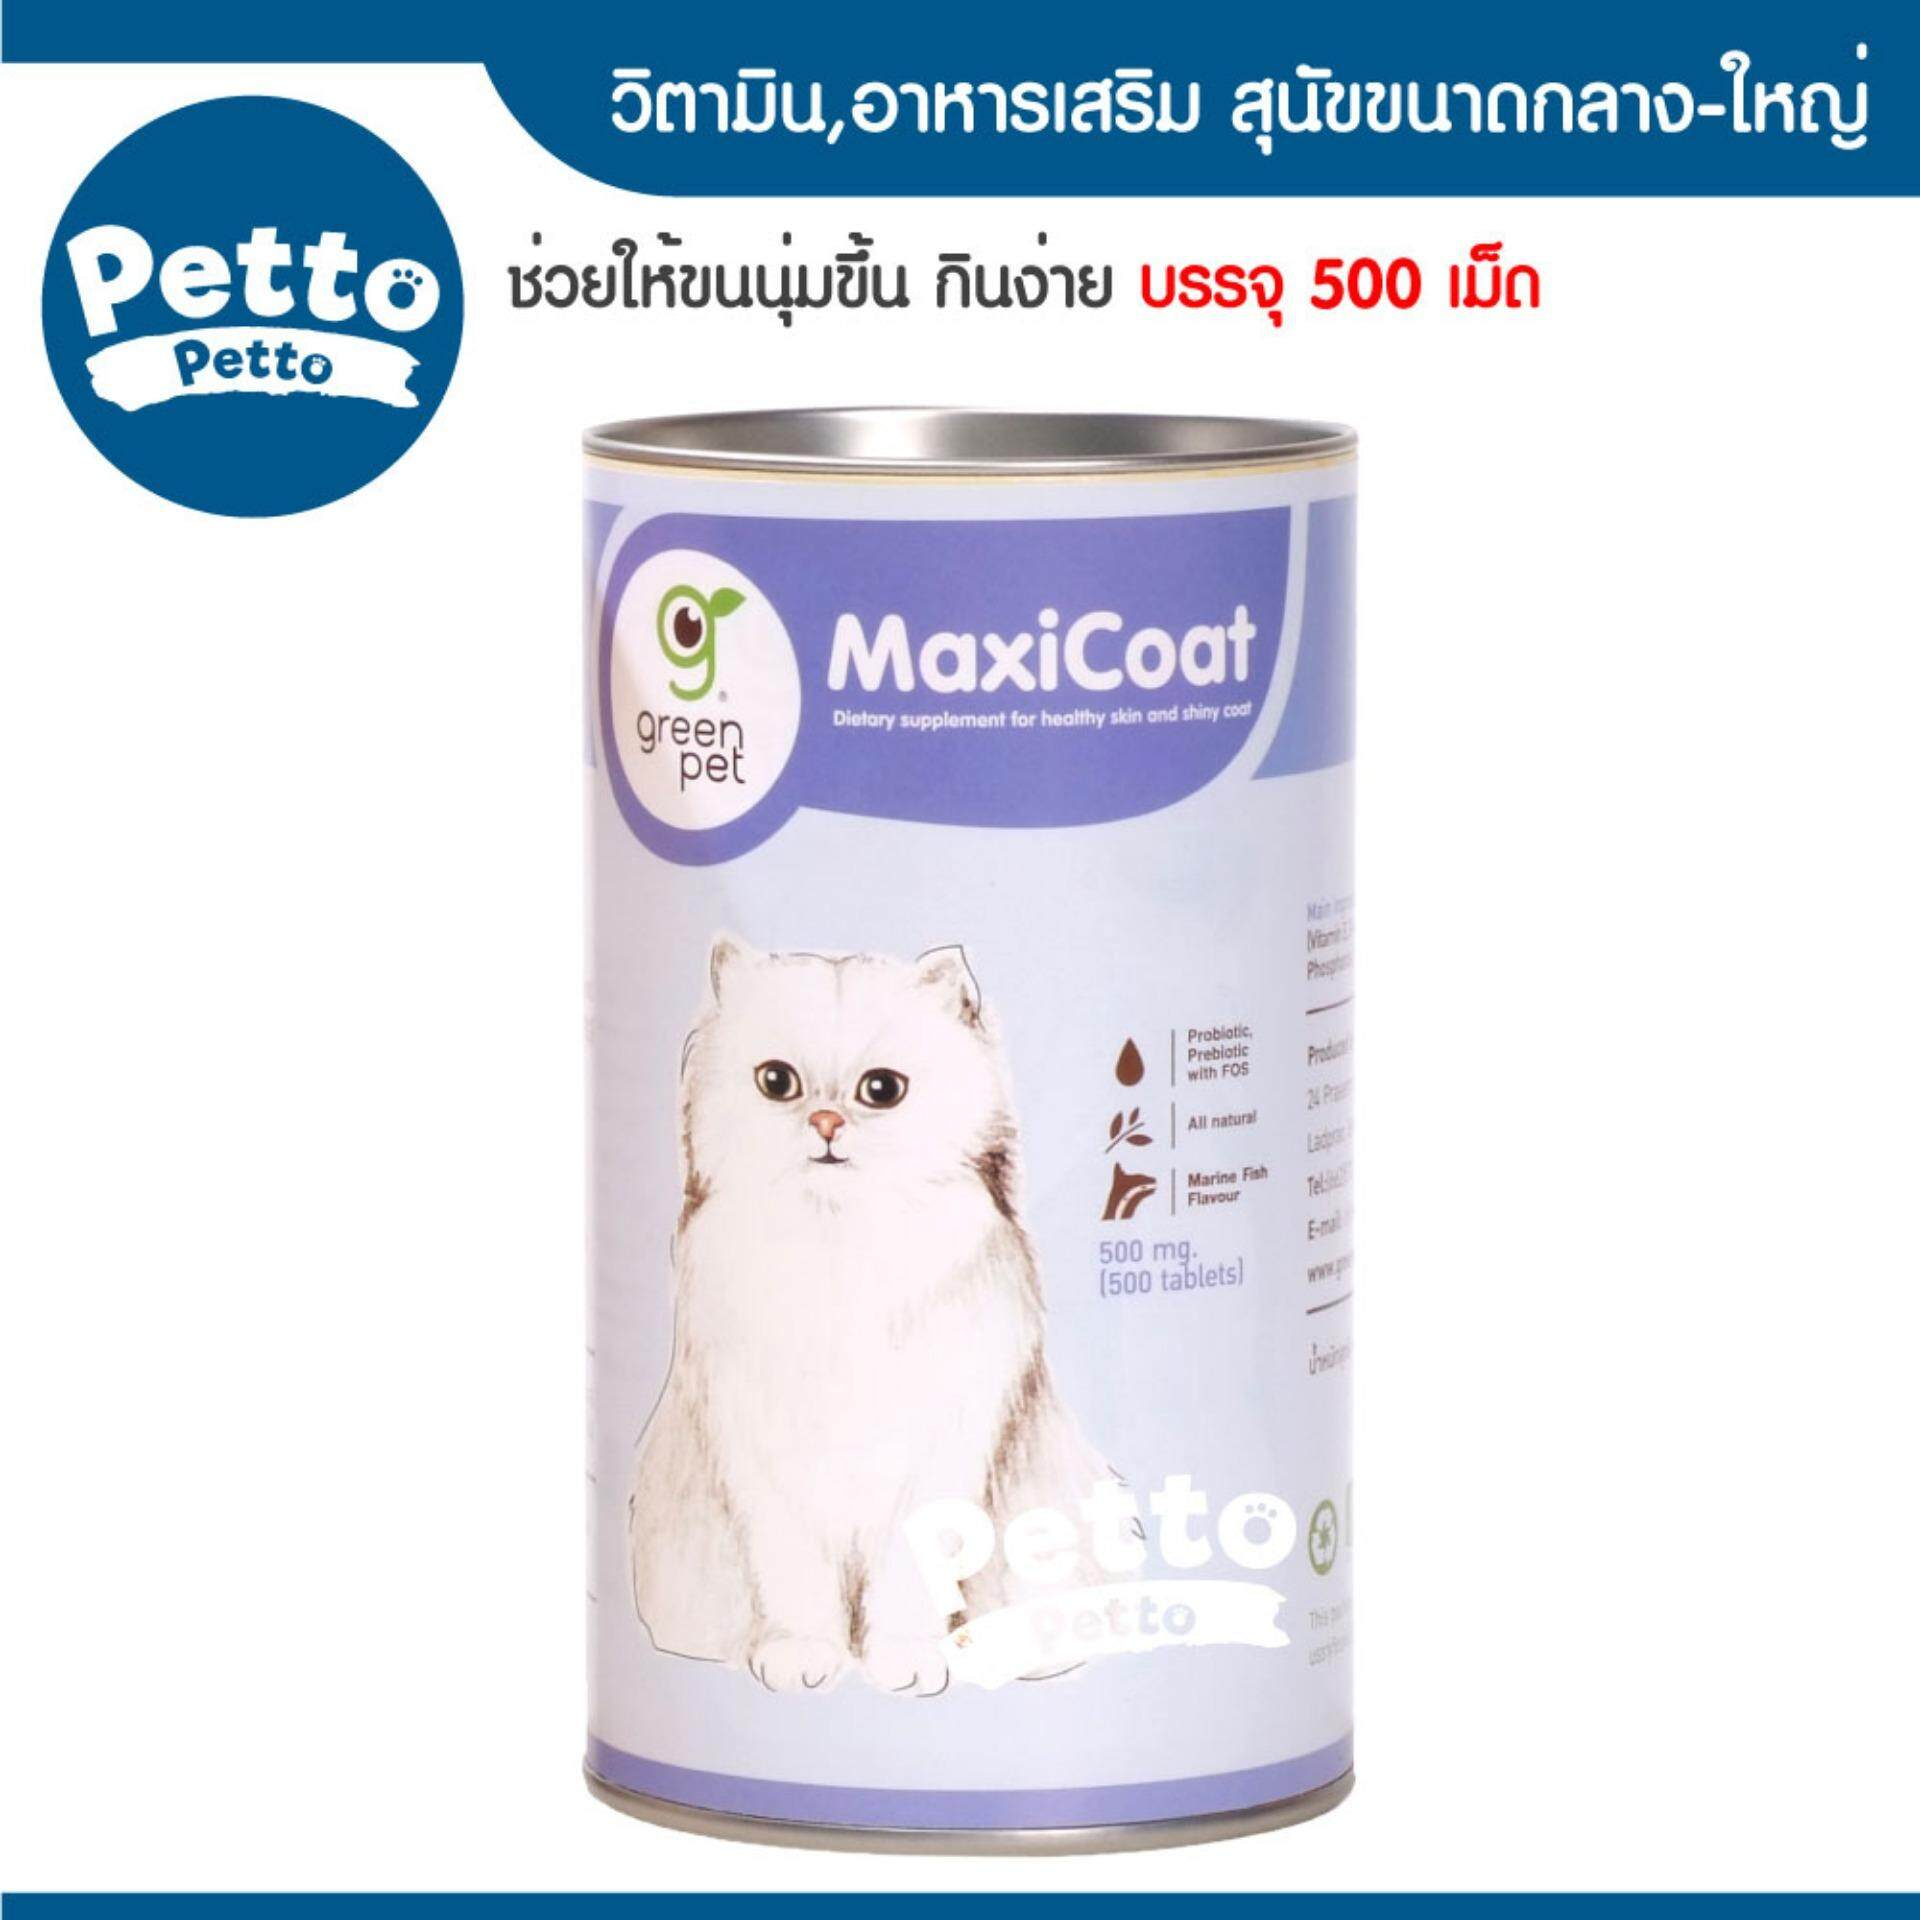 Maxicoat Cat อาหารเสริม วิตามินบำรุงขนและผิวหนัง ลดอาการขนร่วง 500 เม็ด